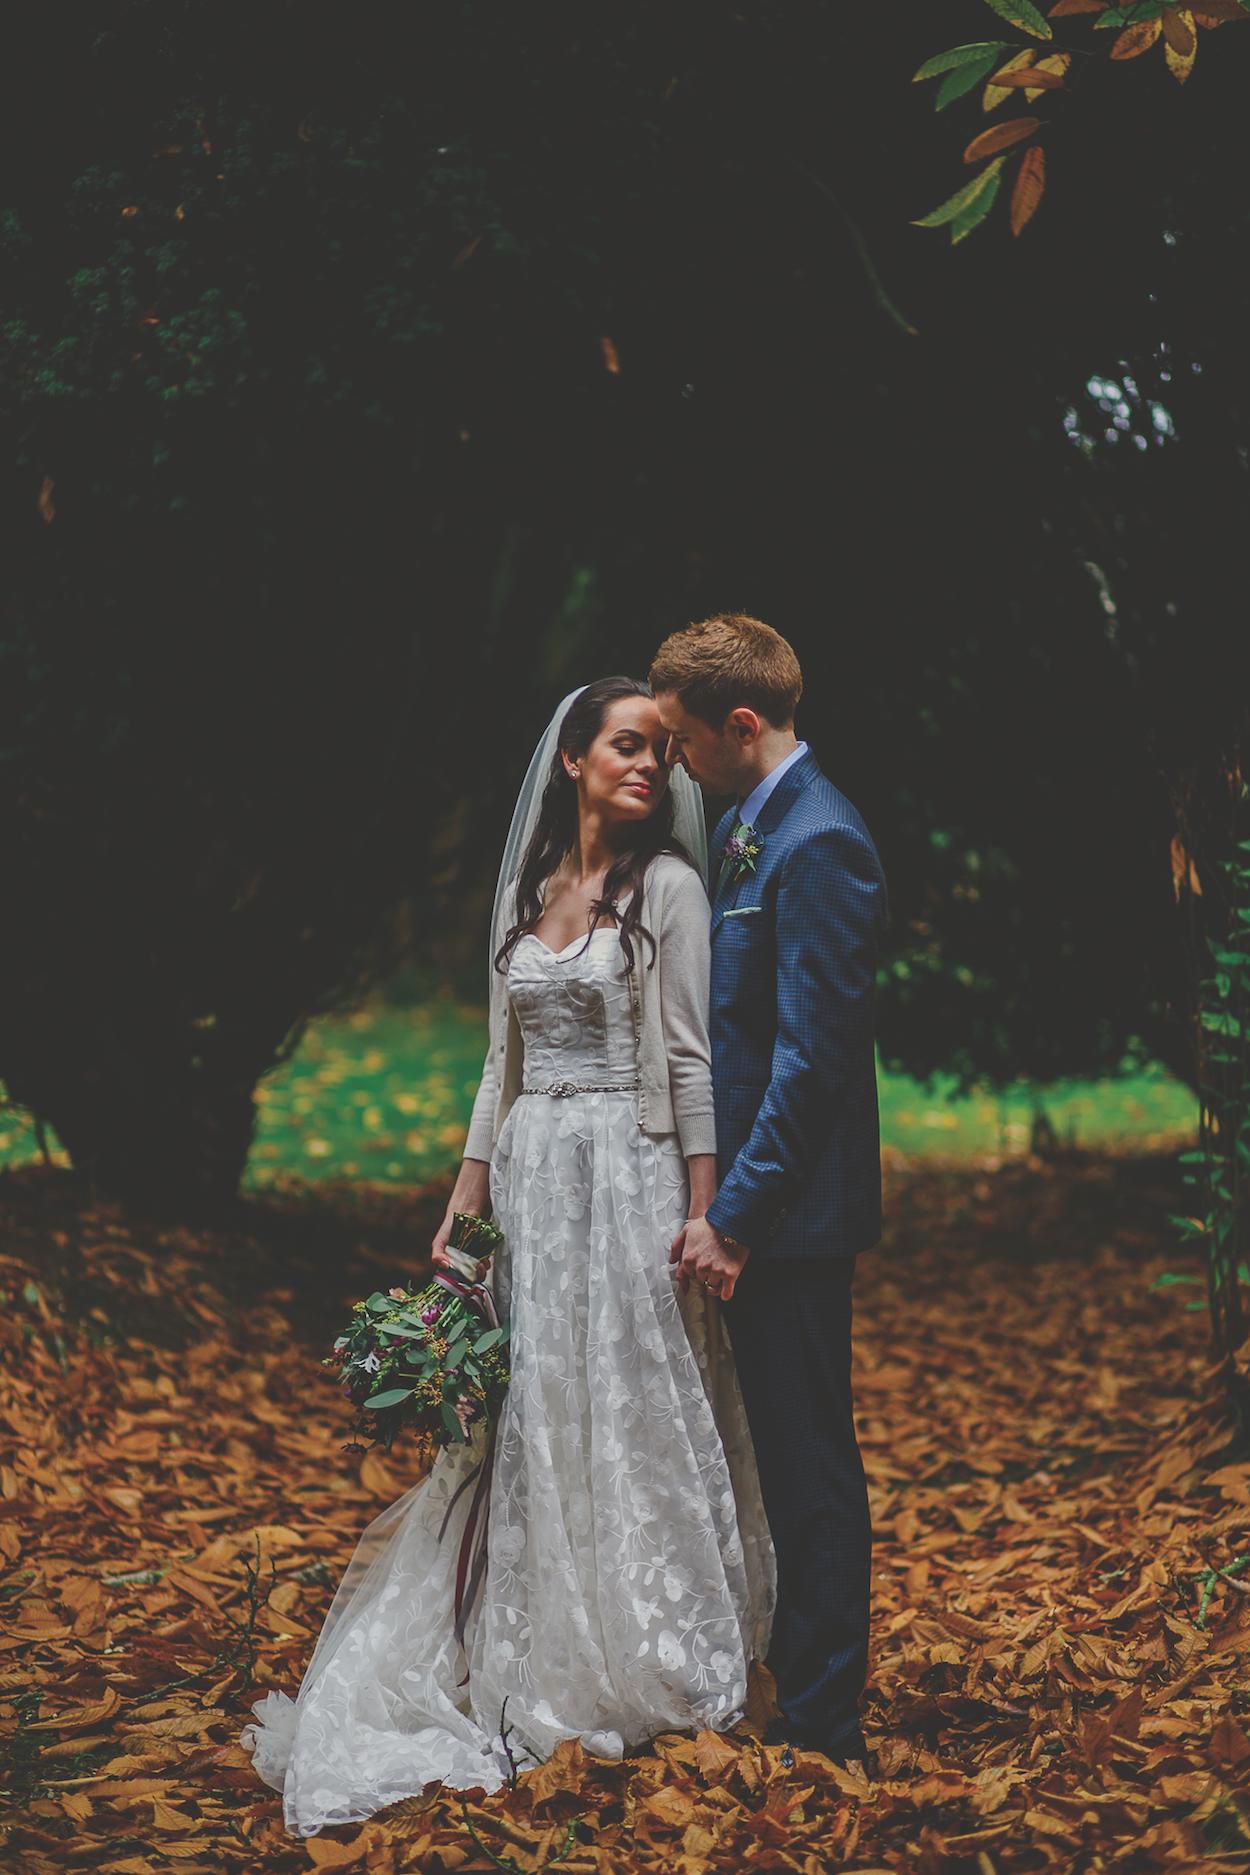 gather_and_tides_wedding_photographer_larchfield_autumn_northern_ireland_Wedding_inspire_Weddings_1.jpg